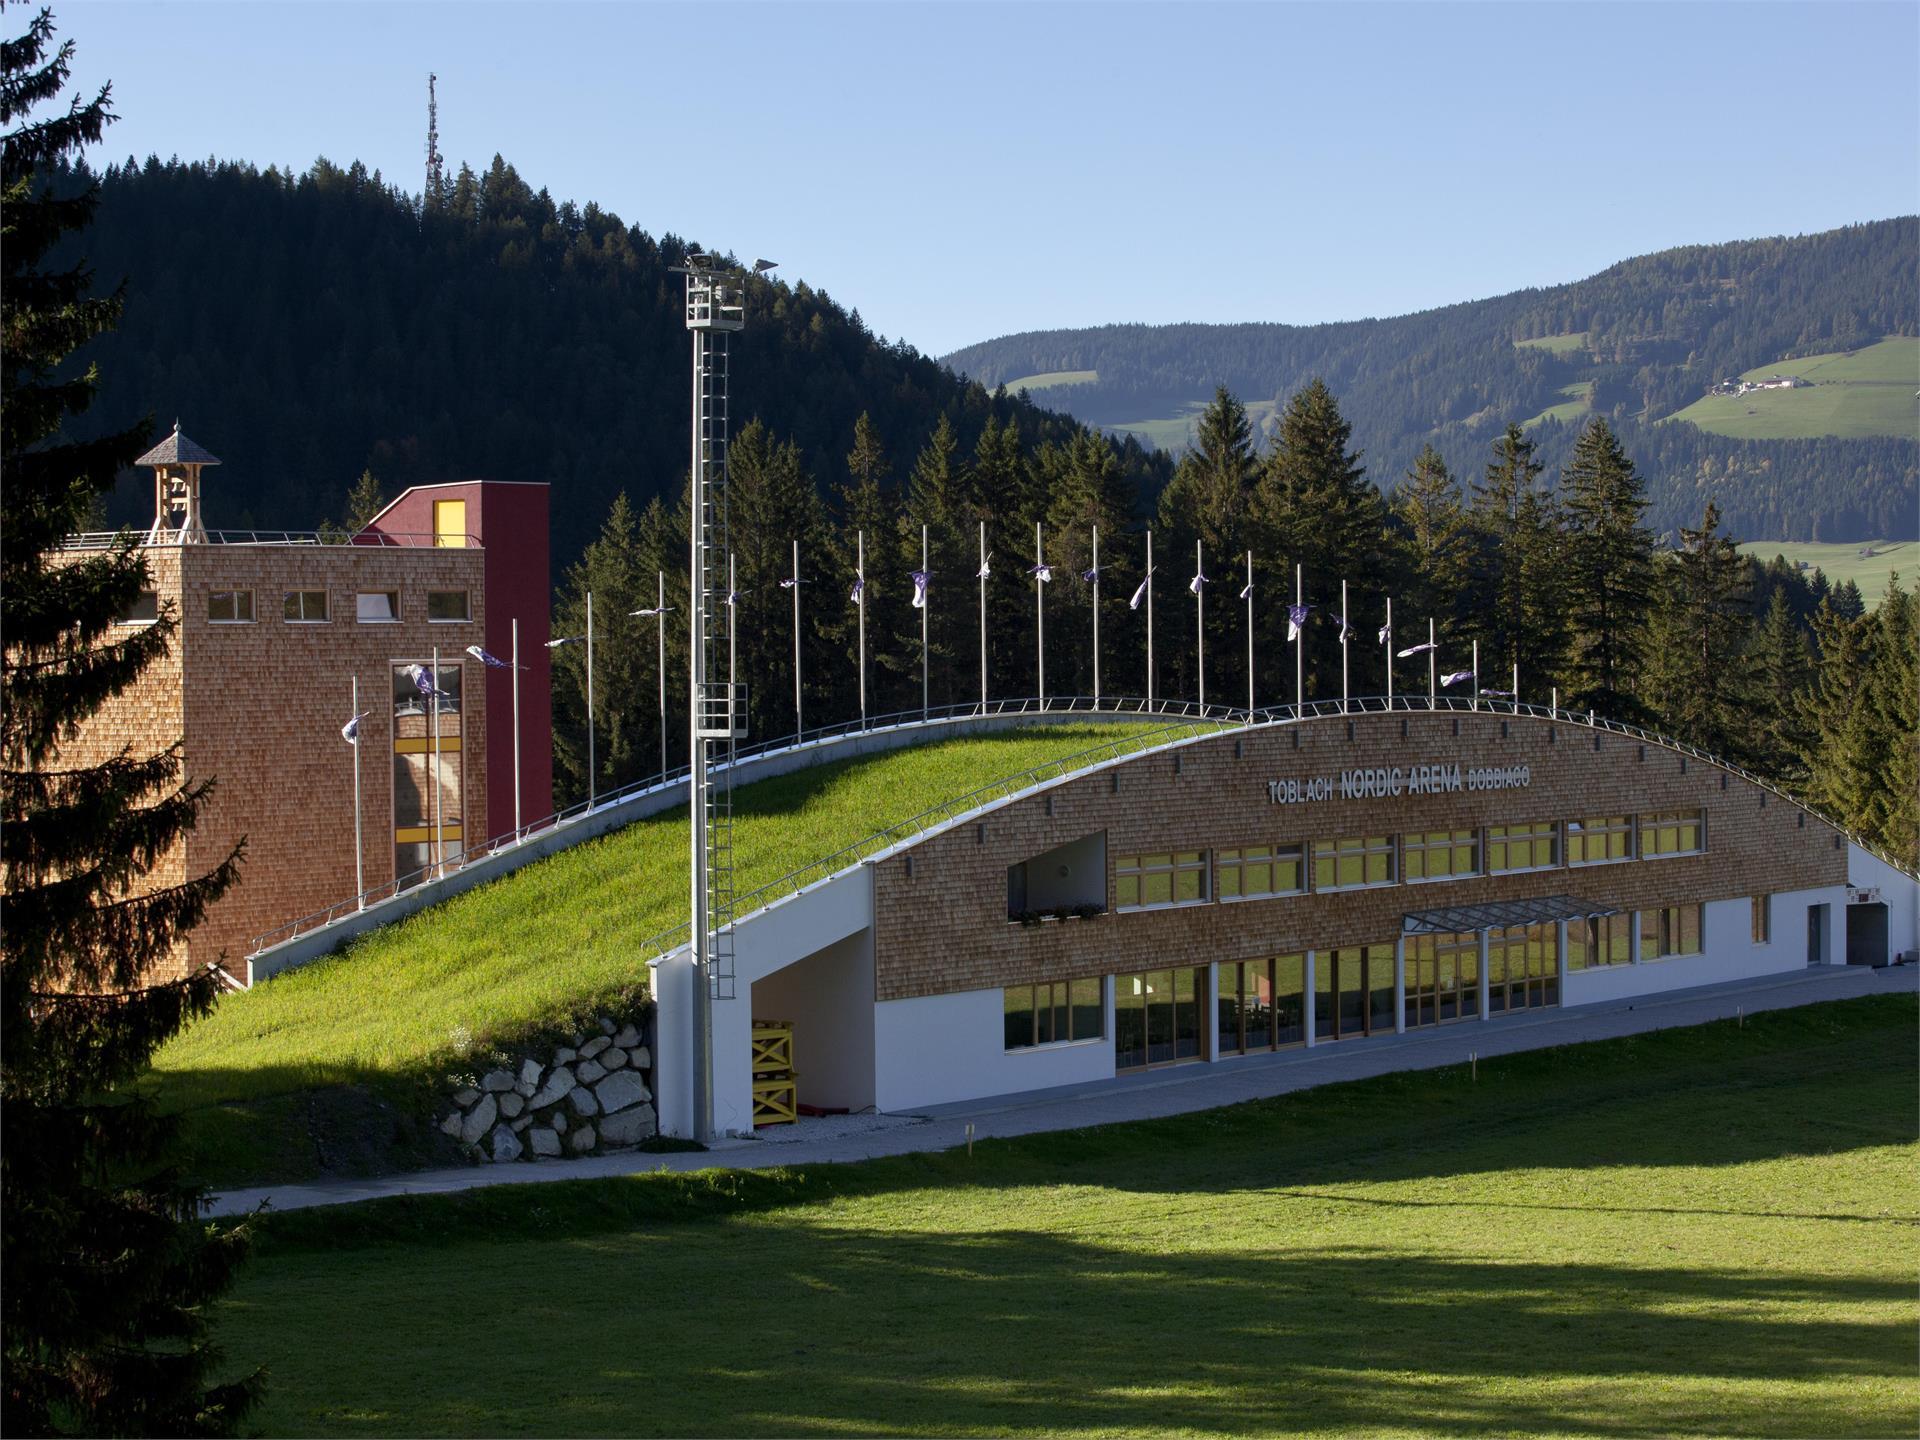 Nordic Arena